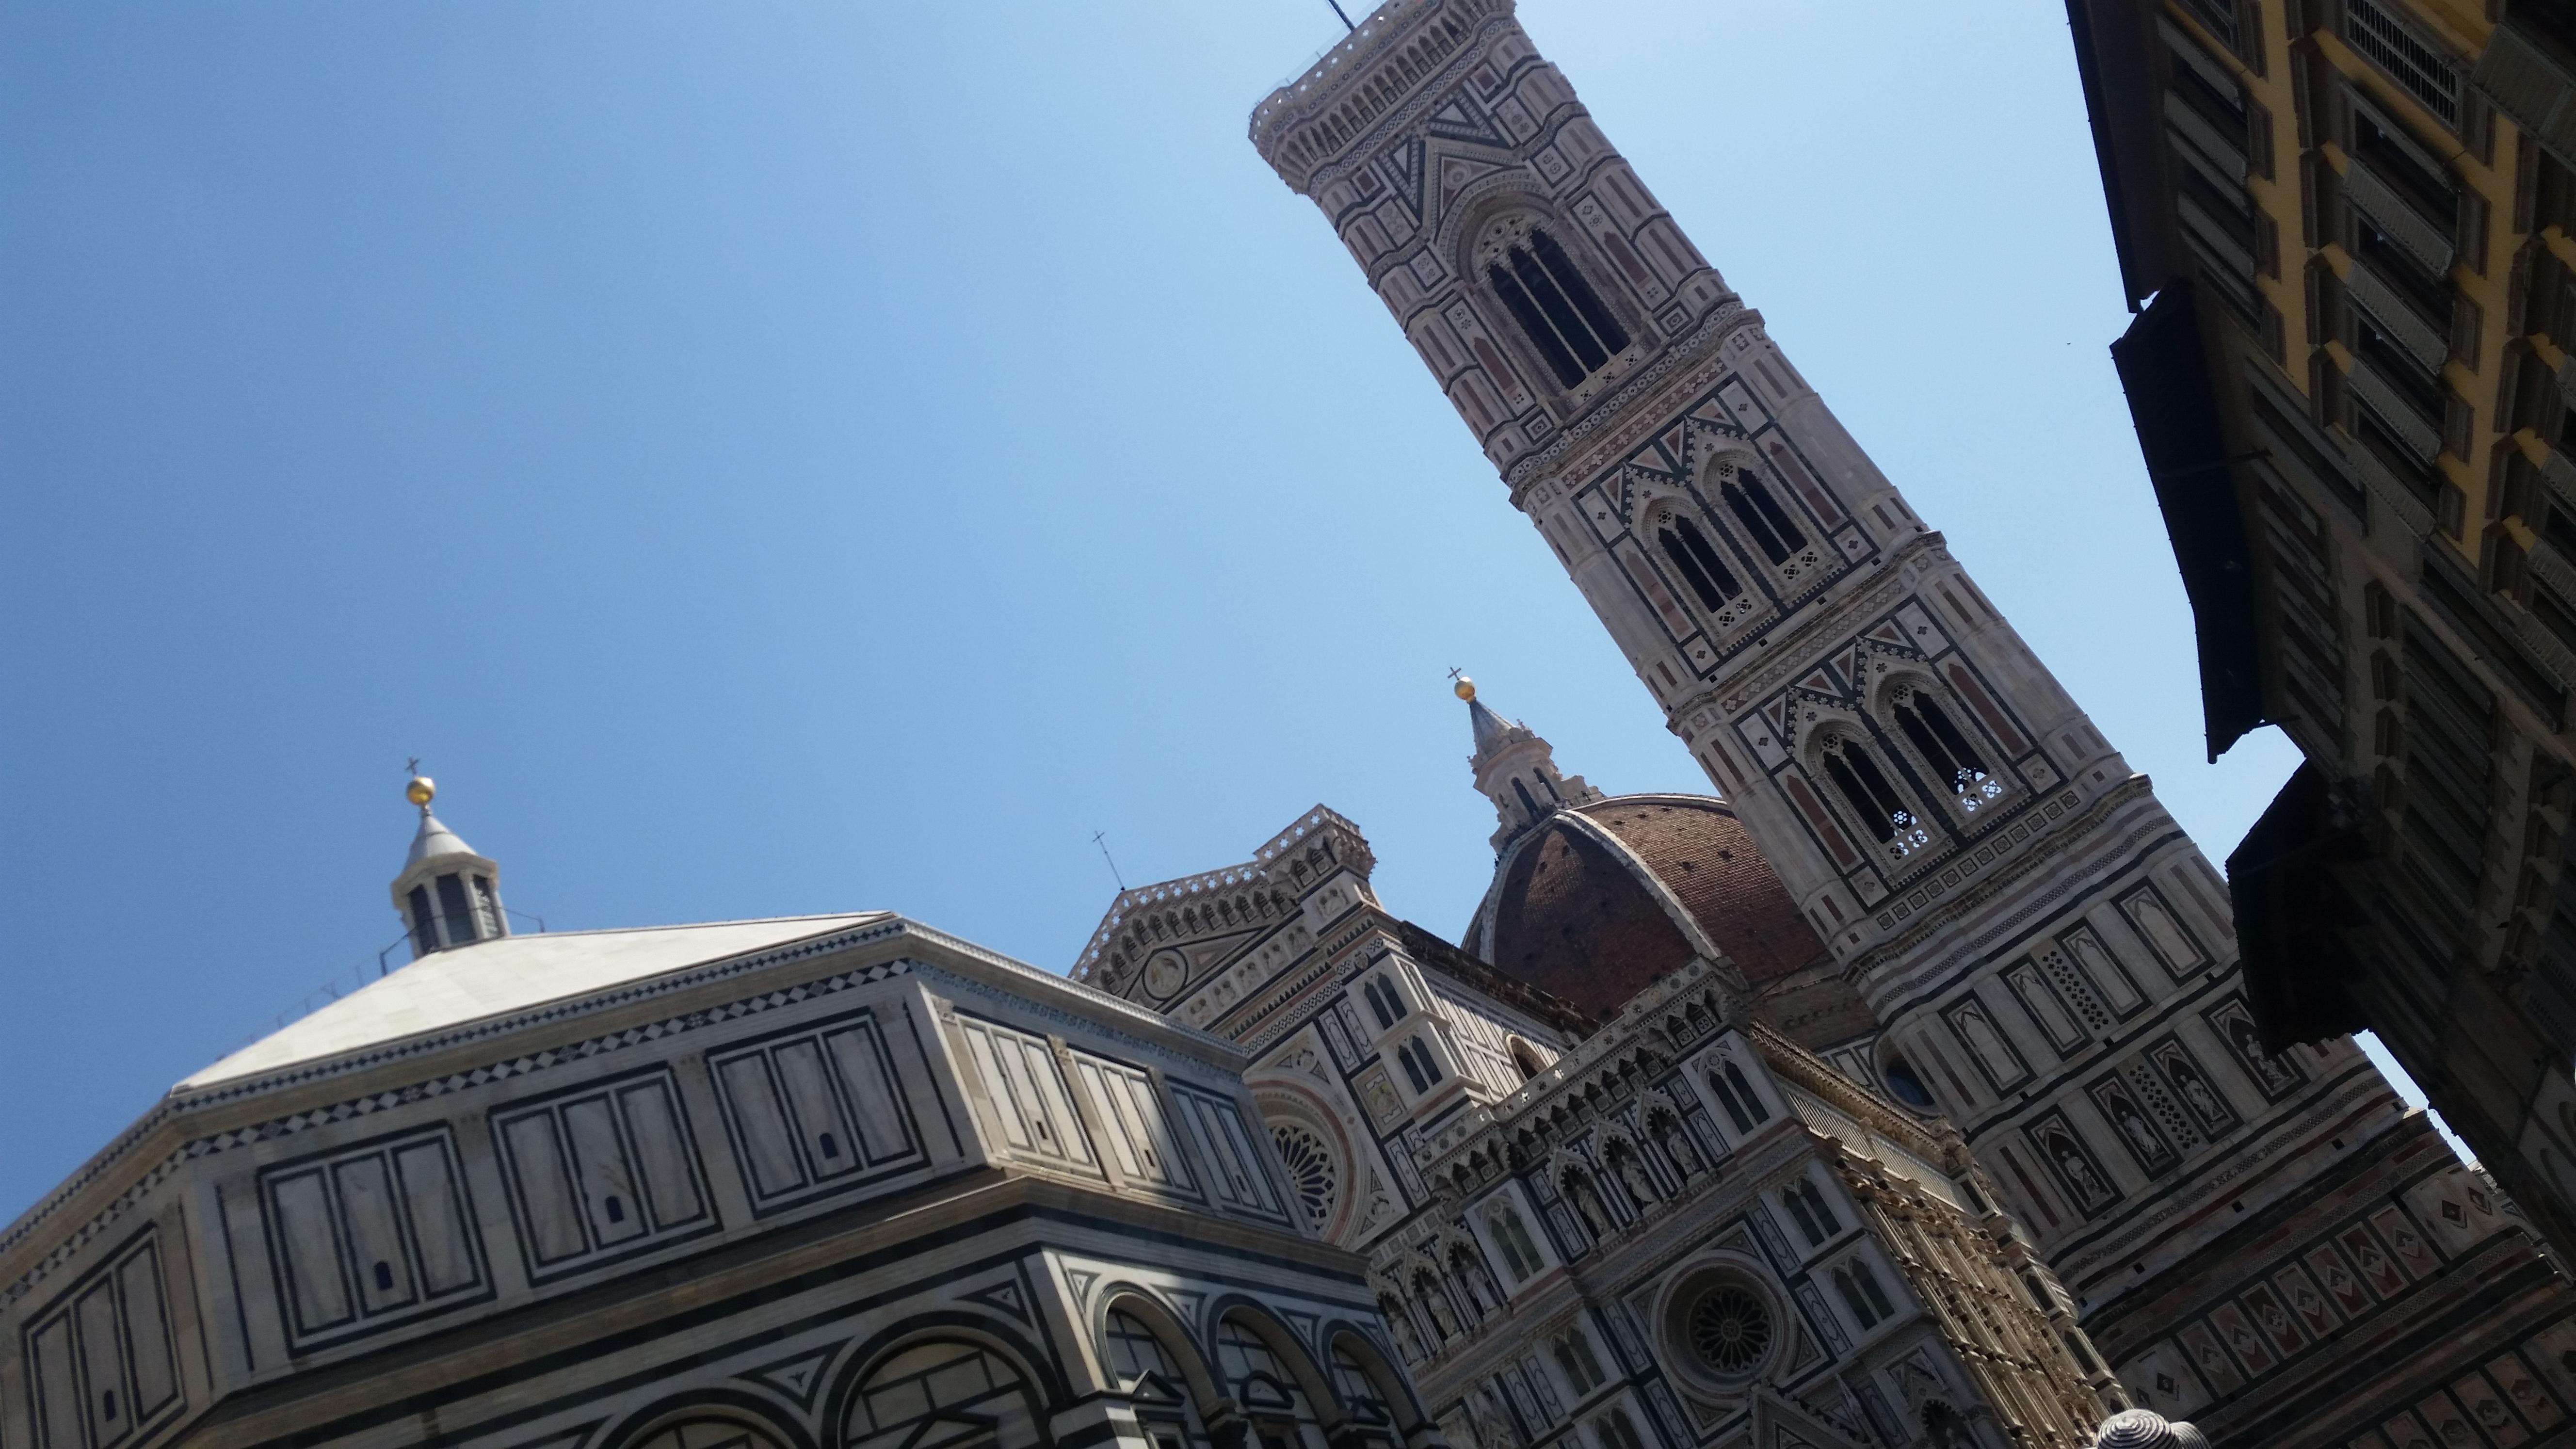 Firenze:花の都フィレンツェ街歩き